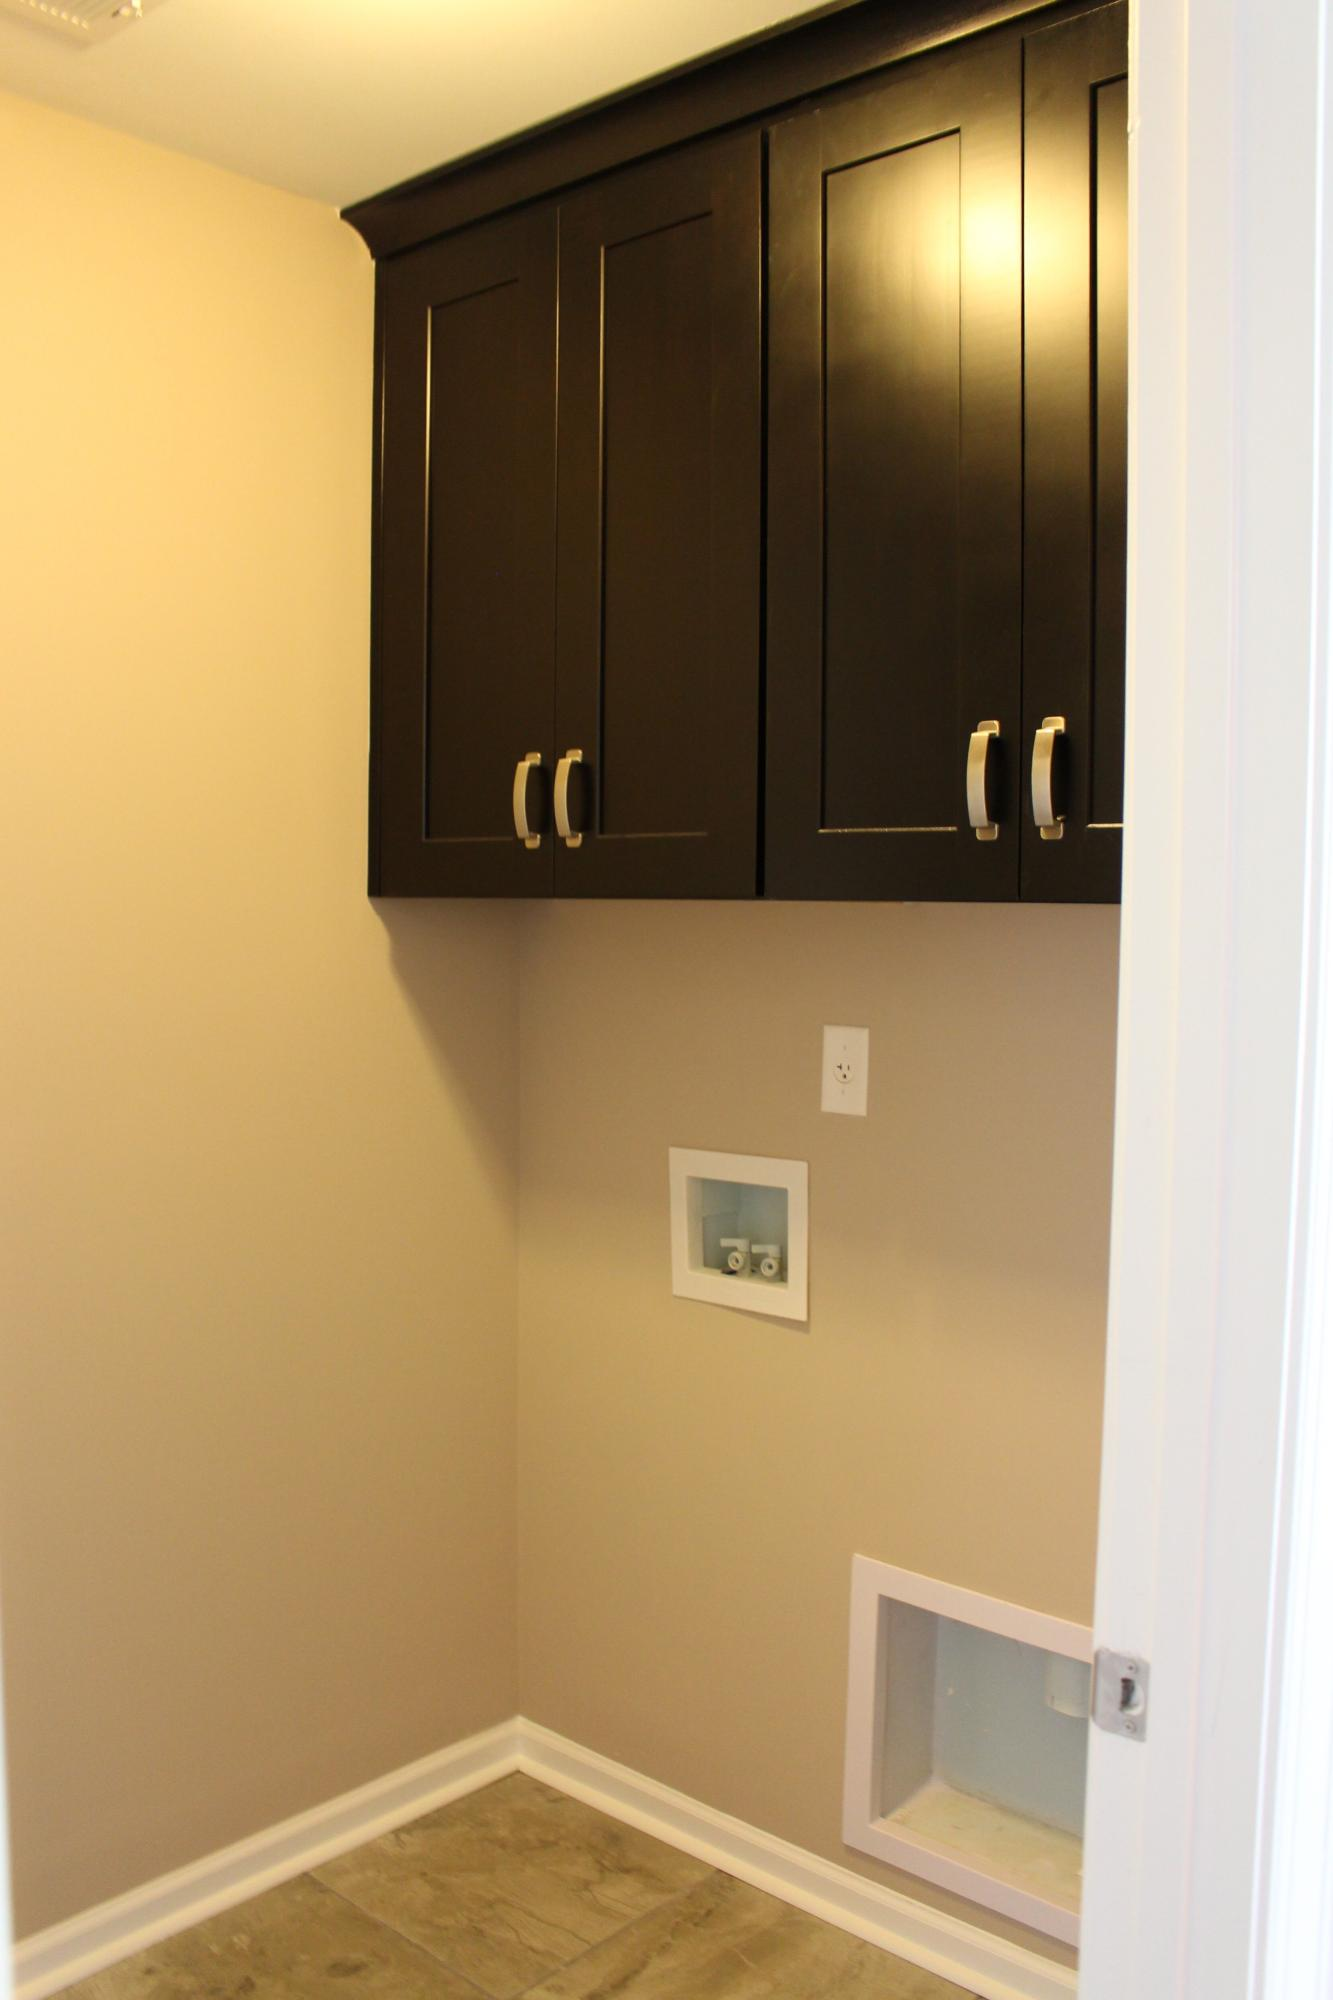 Filbin Creek Homes For Sale - 1173 Sumner, North Charleston, SC - 5